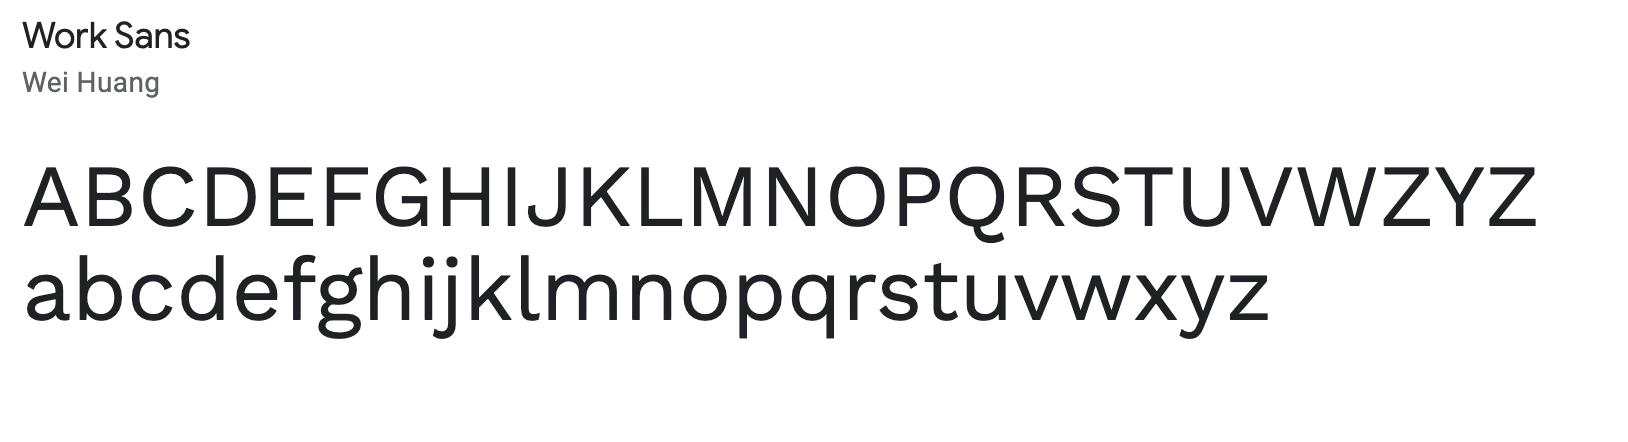 Work Sans - Serif email signature font